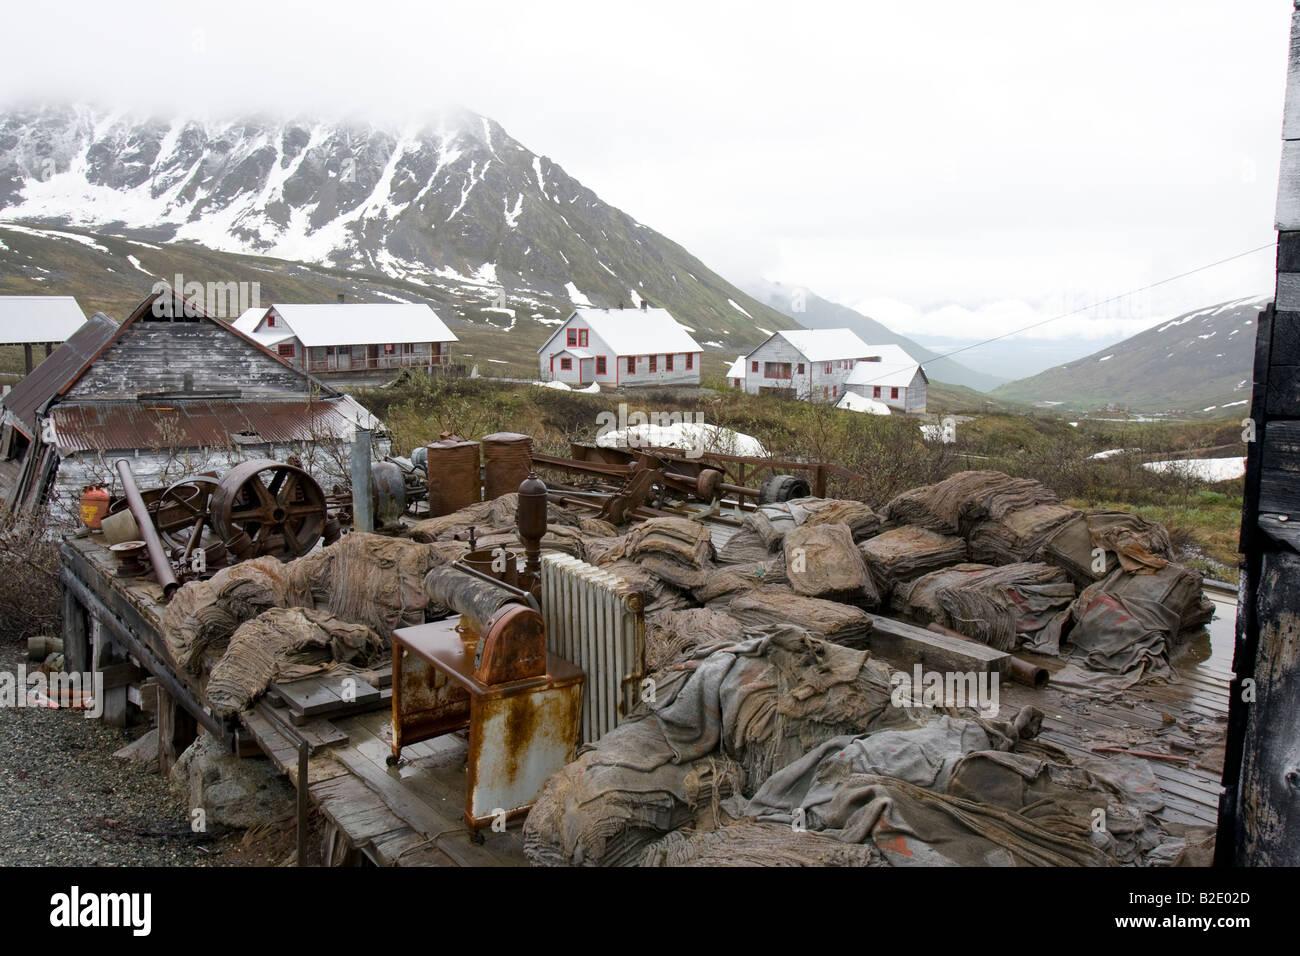 Abandoned Independence mine at Hatcher pass, Alaska, USA Stock Photo